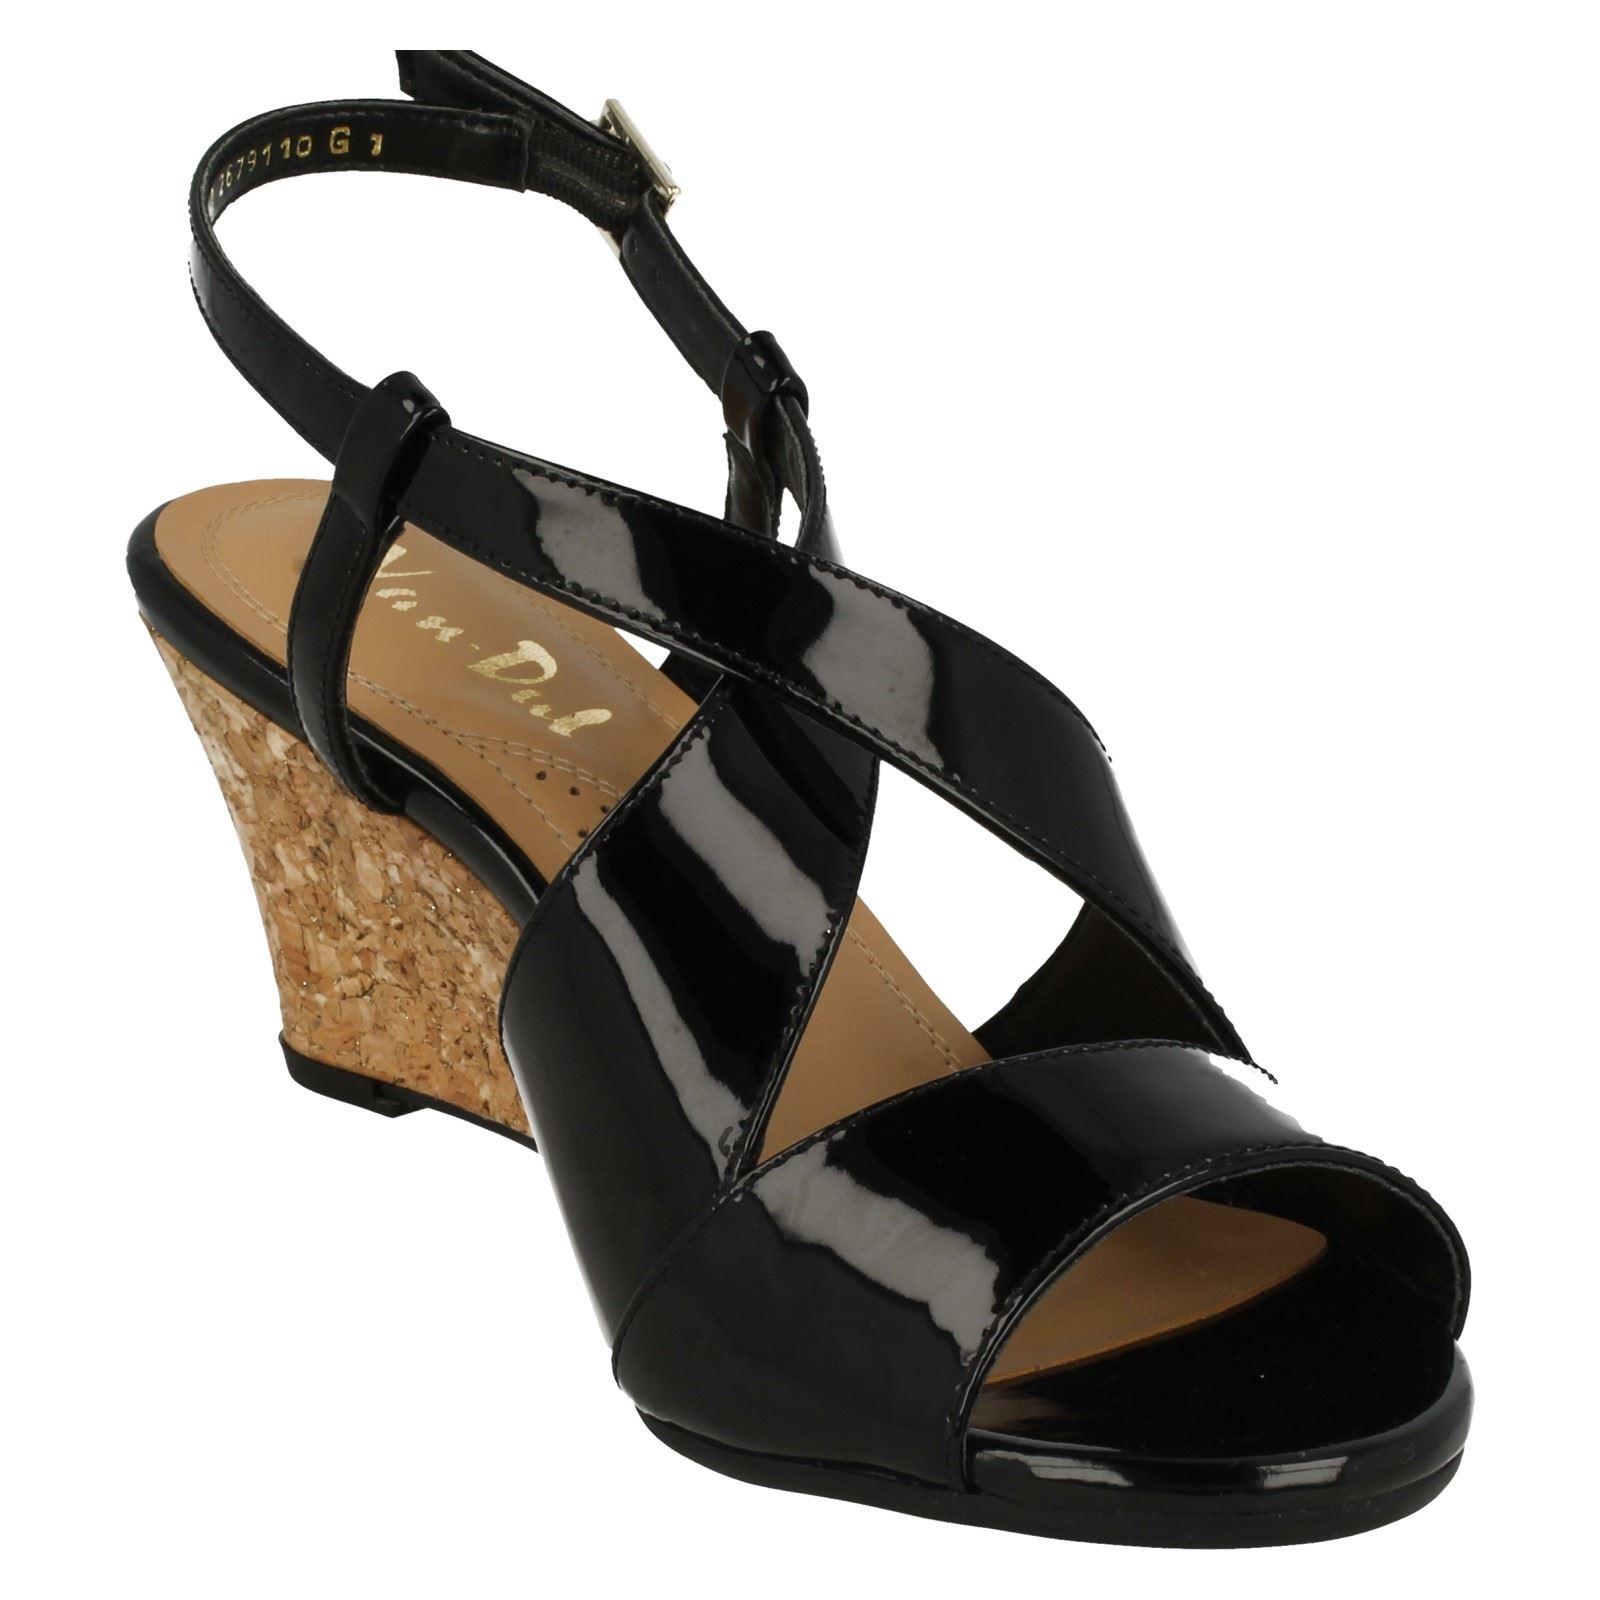 Ladies-Van-Dal-Cross-Strap-Wedged-Sandal-Allora thumbnail 19